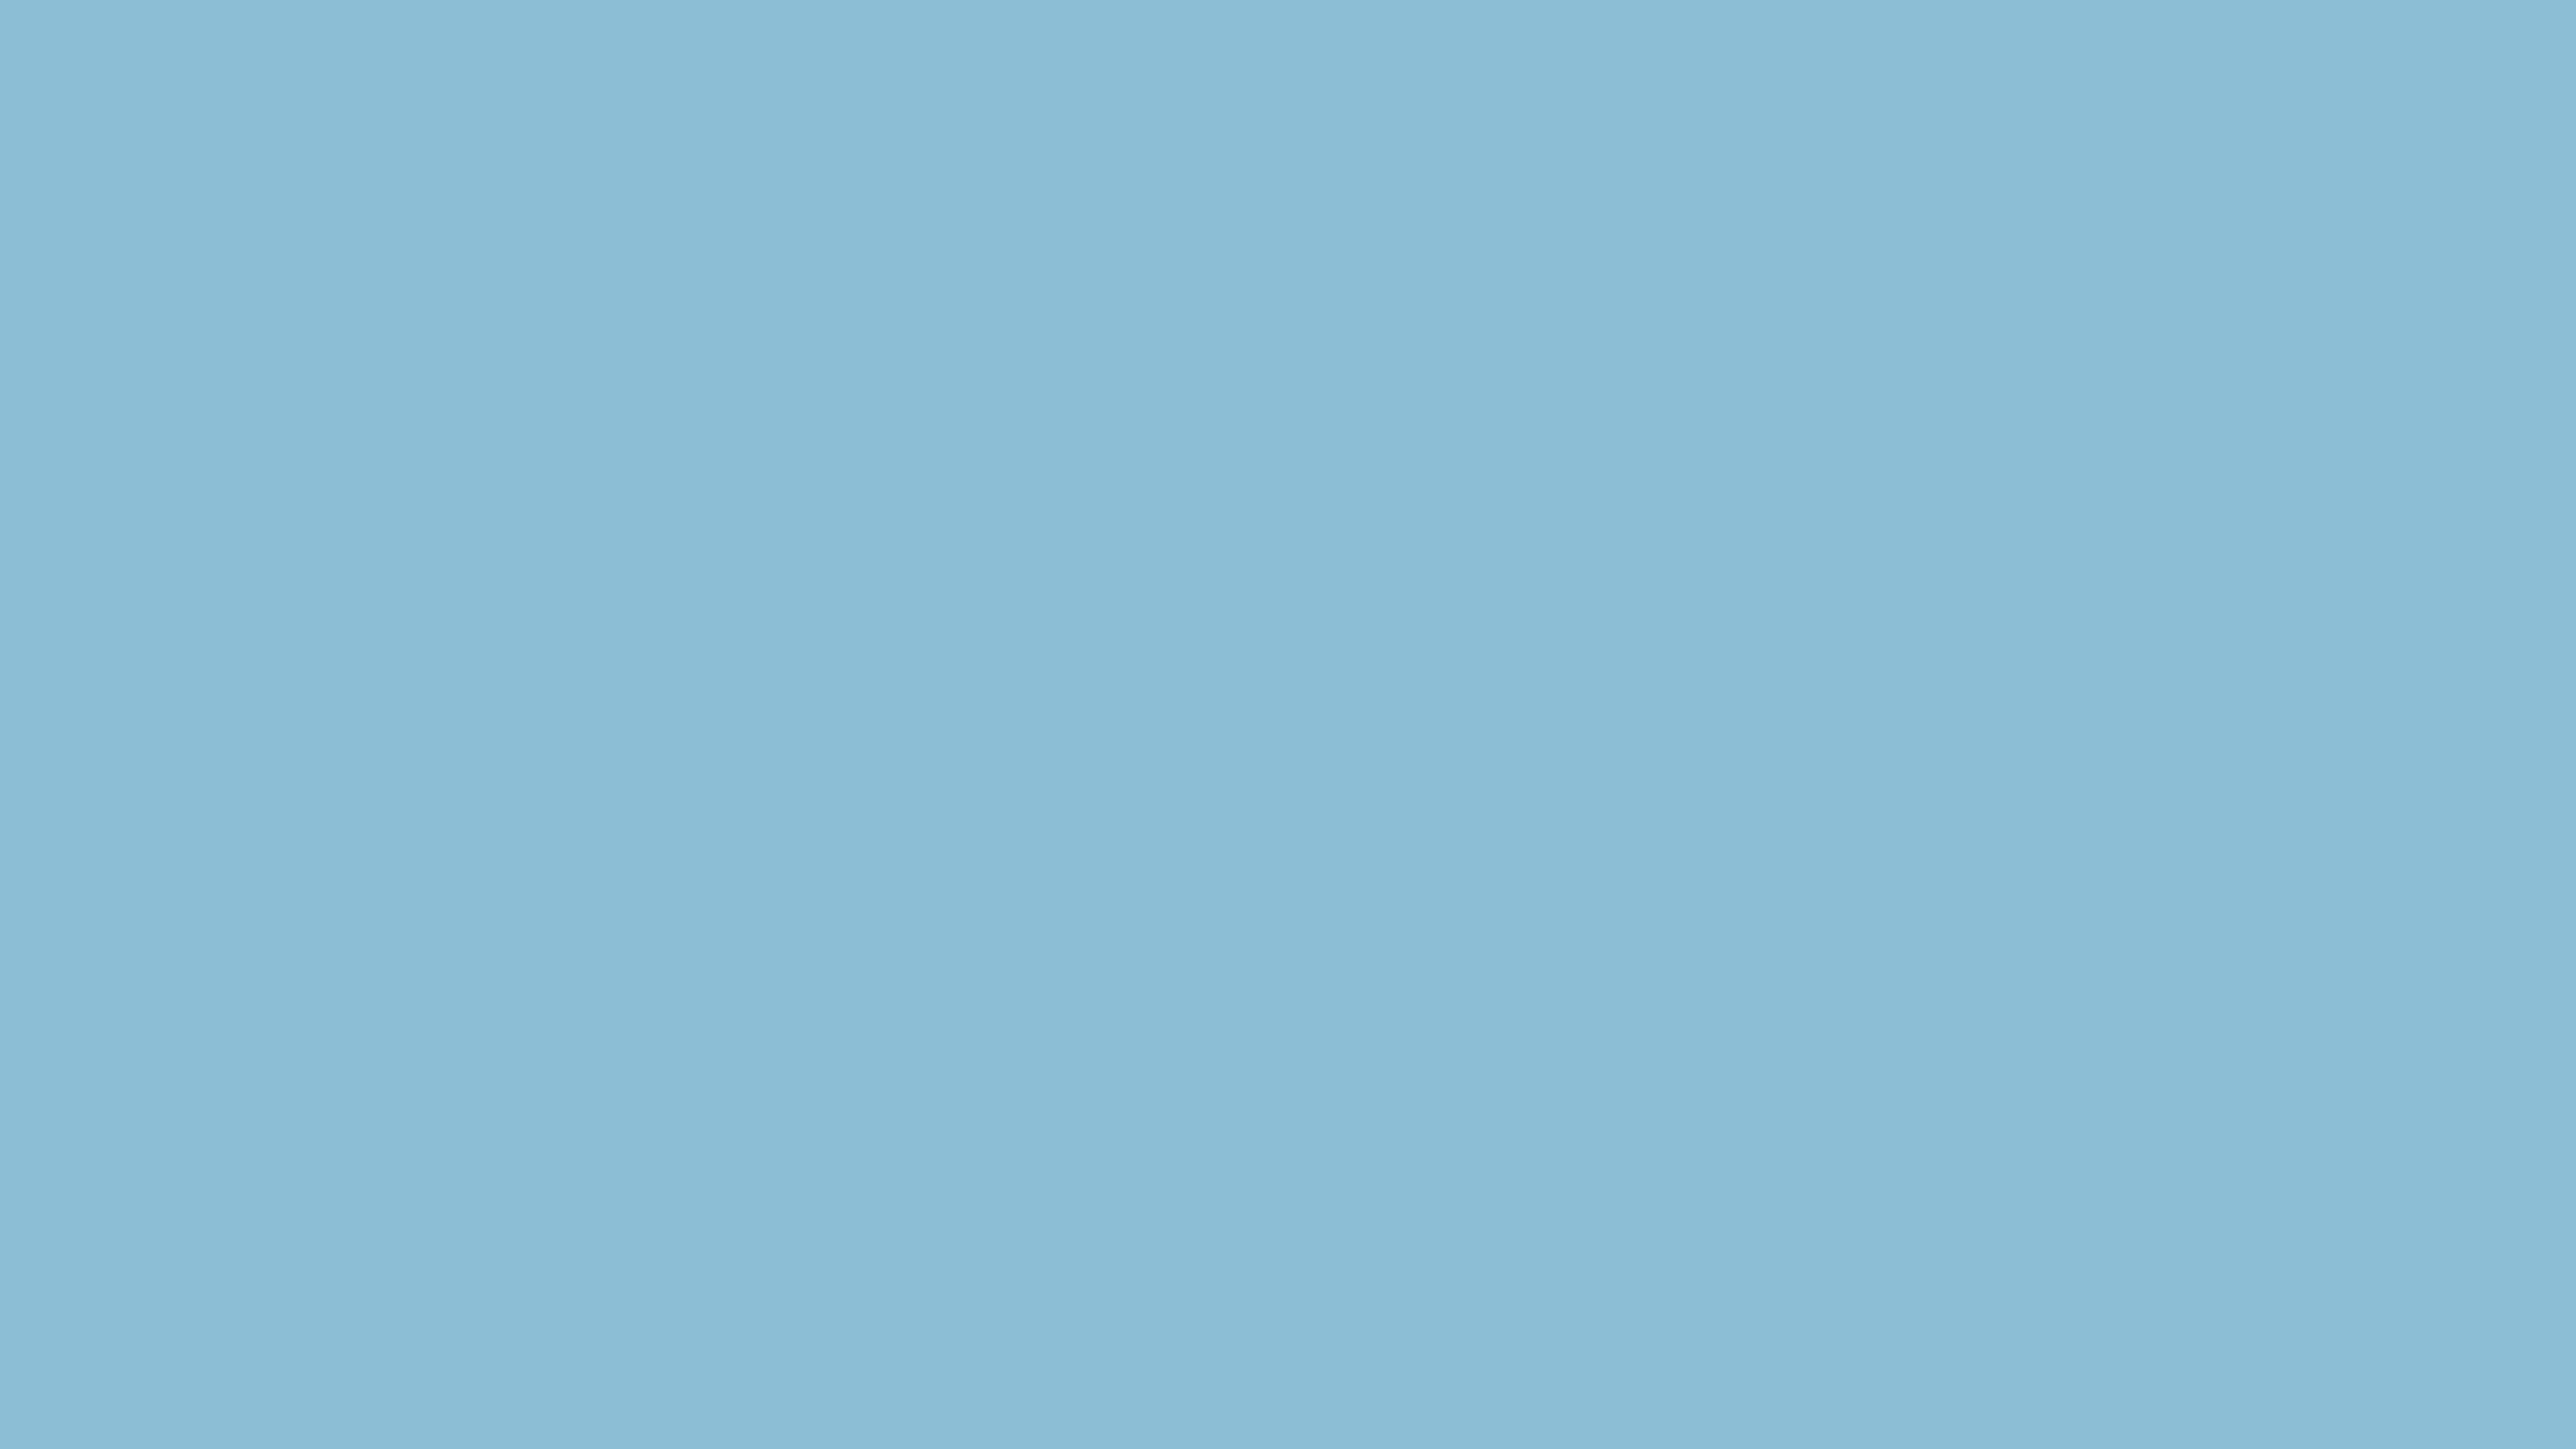 5120x2880 Dark Sky Blue Solid Color Background